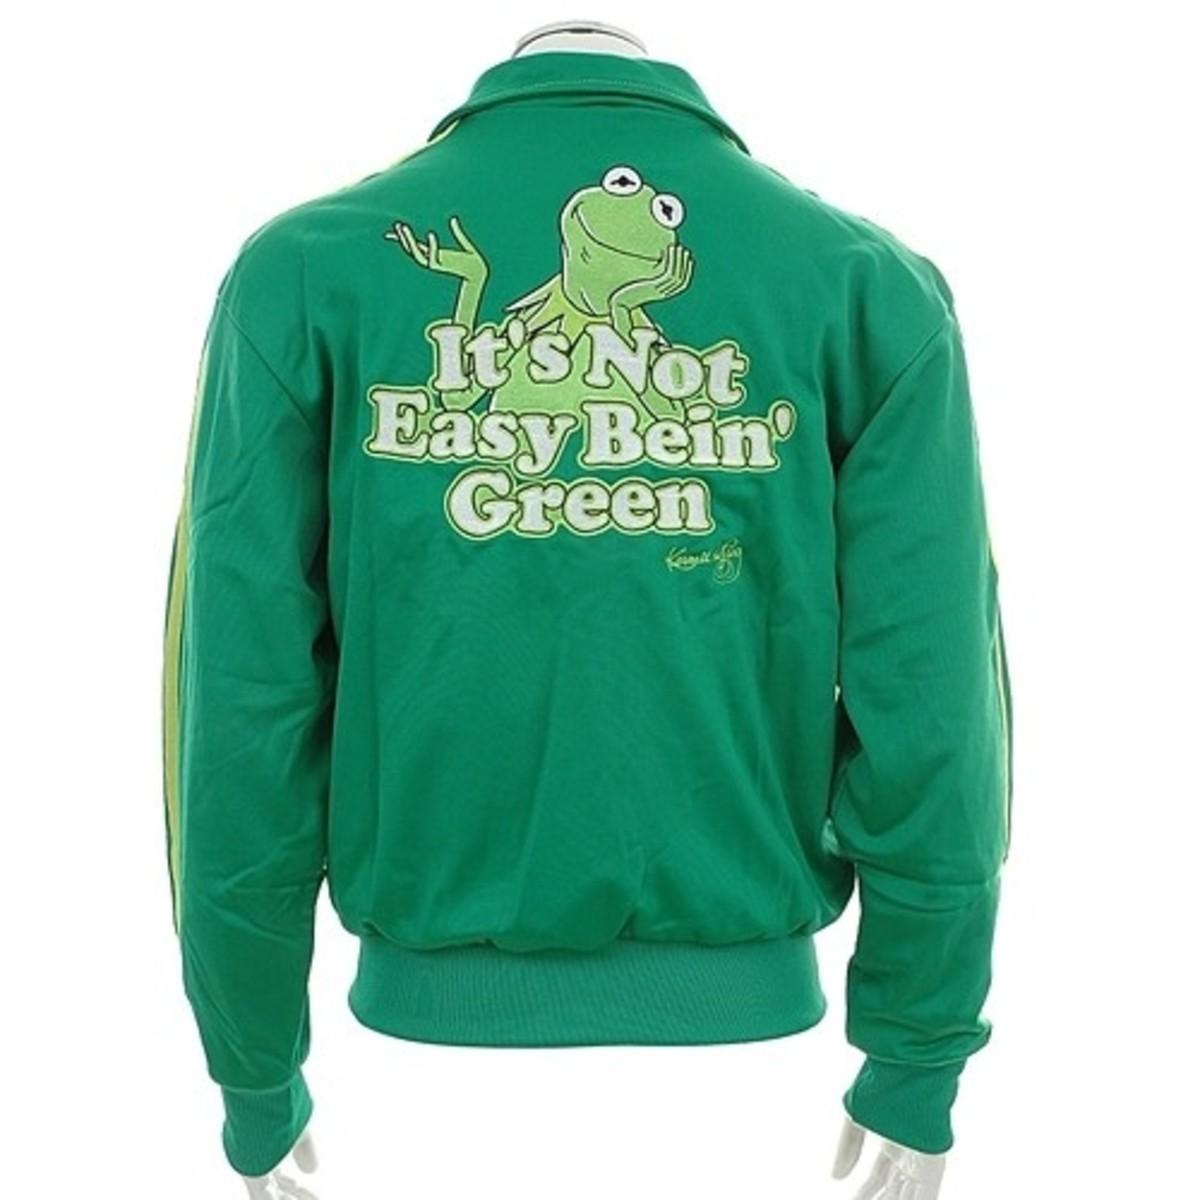 Kermit the Frog Adidas Track Jacket